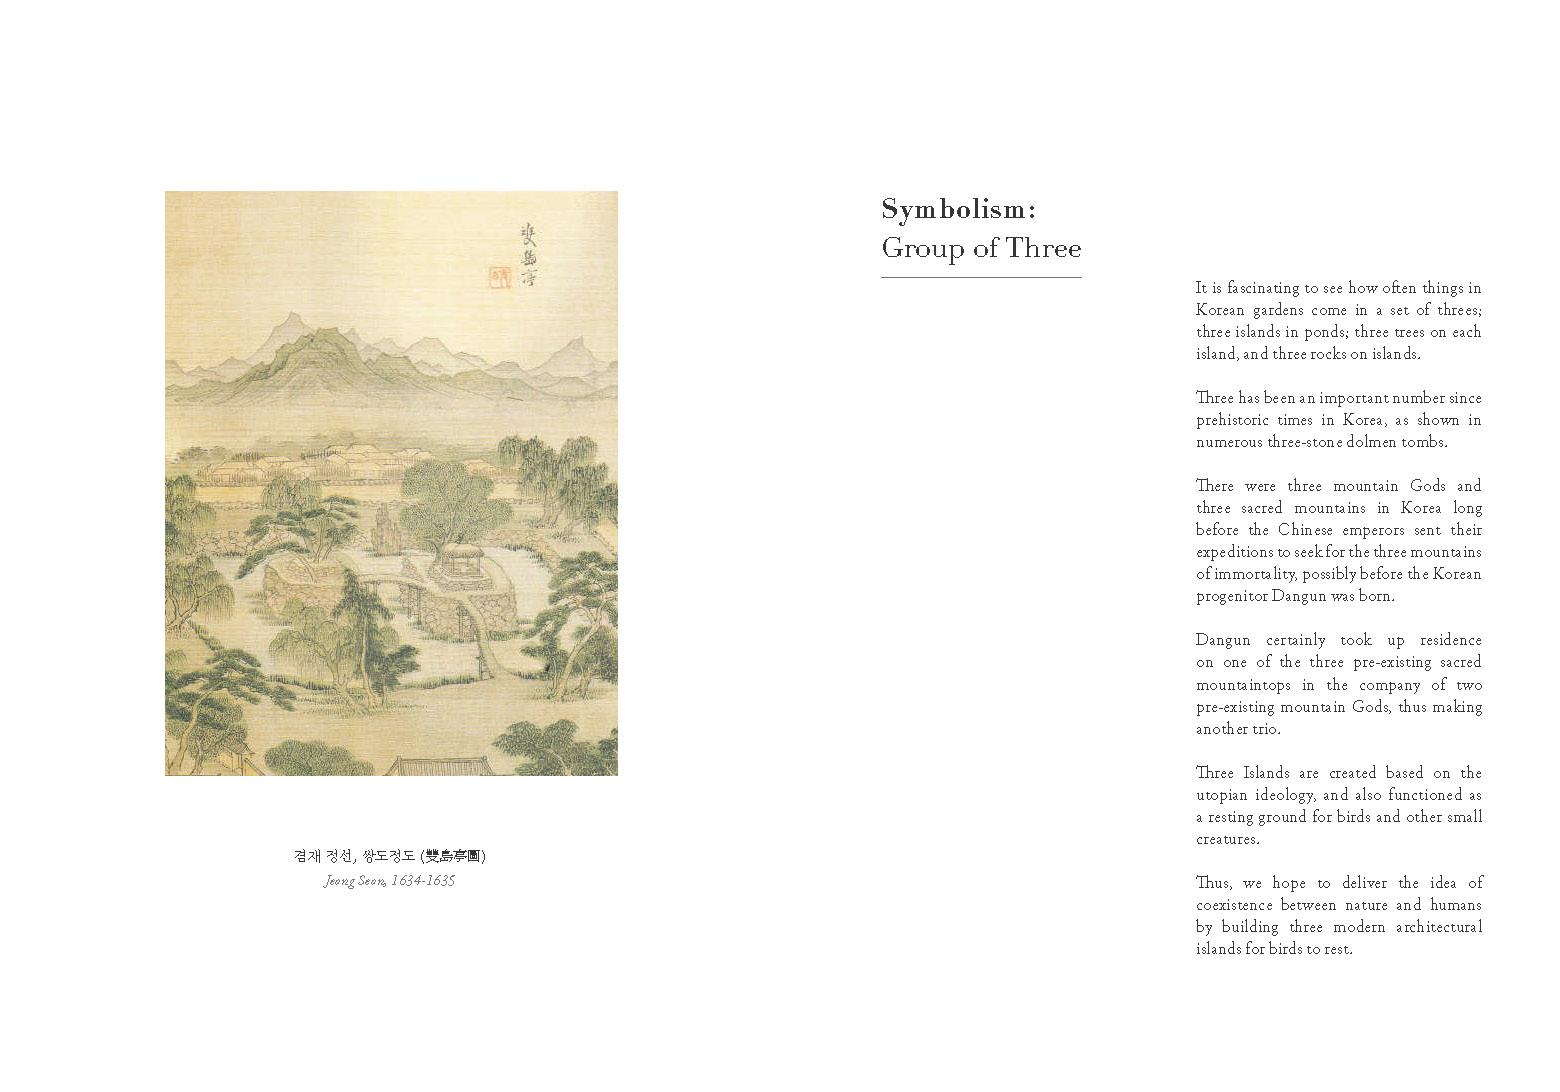 Wallpaper Handmade_Design & Concept_190405_Page_2.jpg